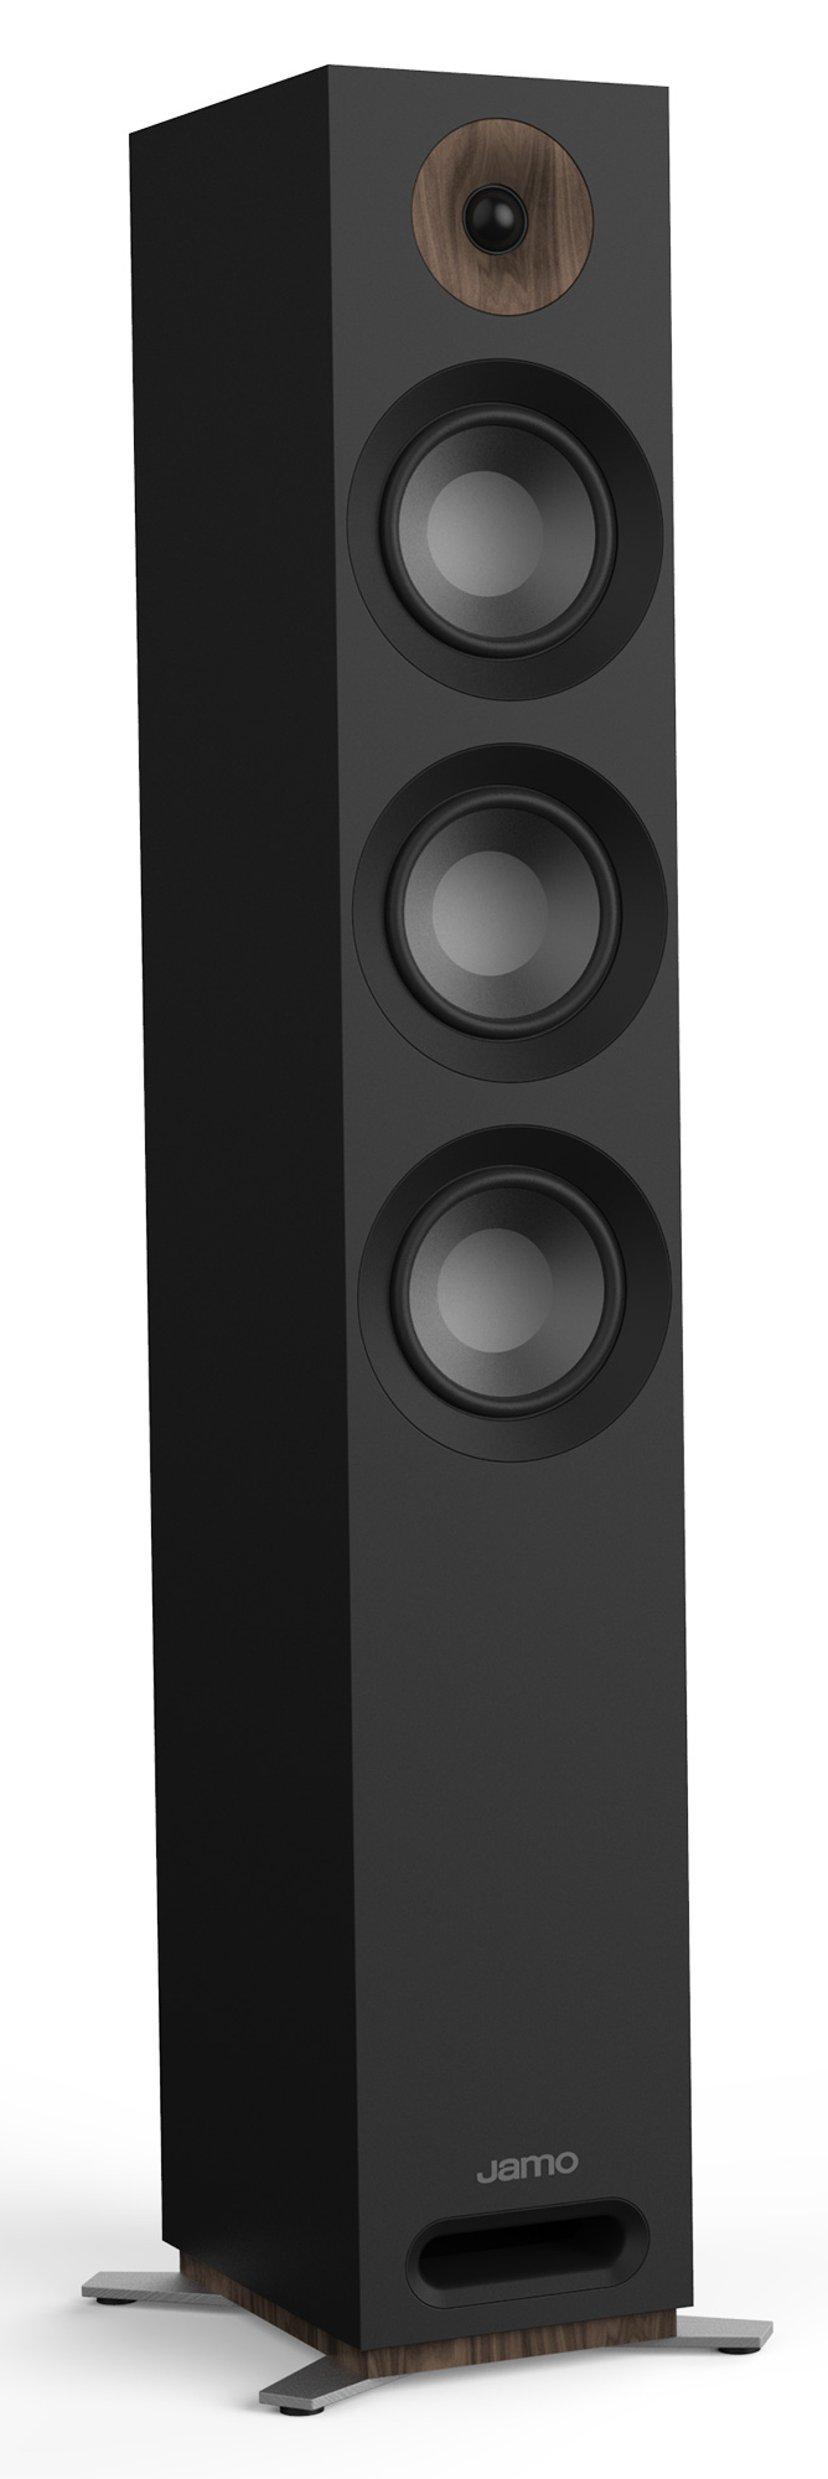 Jamo S 809 HCS 5.0 Speaker Package